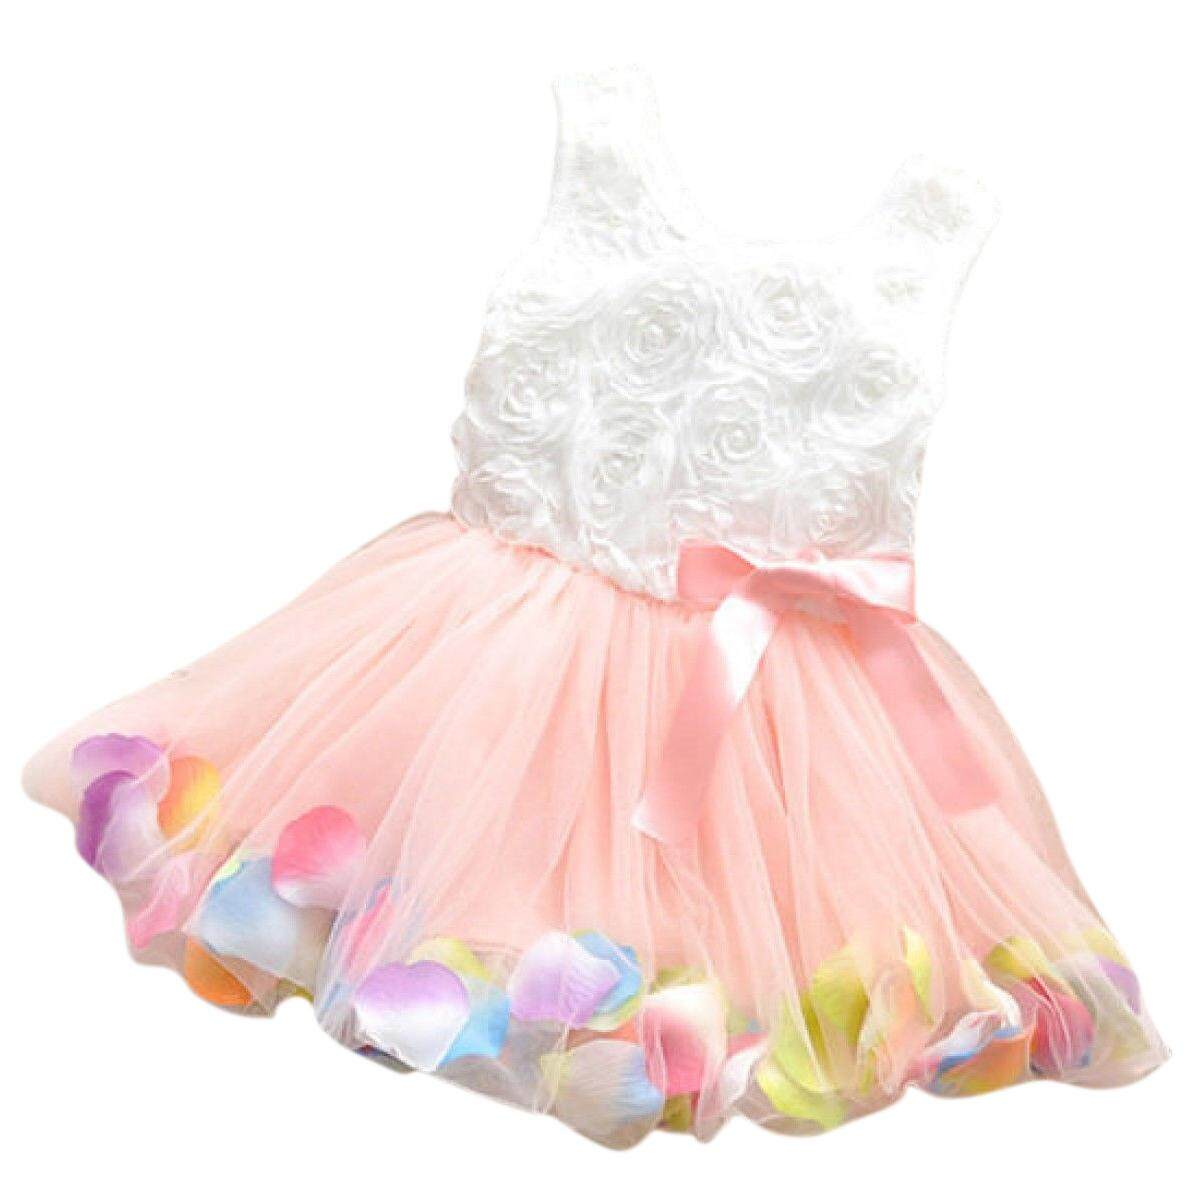 db2bd4736c25 Baby Girl Toddler Occasion Party Wedding Birthday Flower Summer Kids Dress  pink 90 - intl